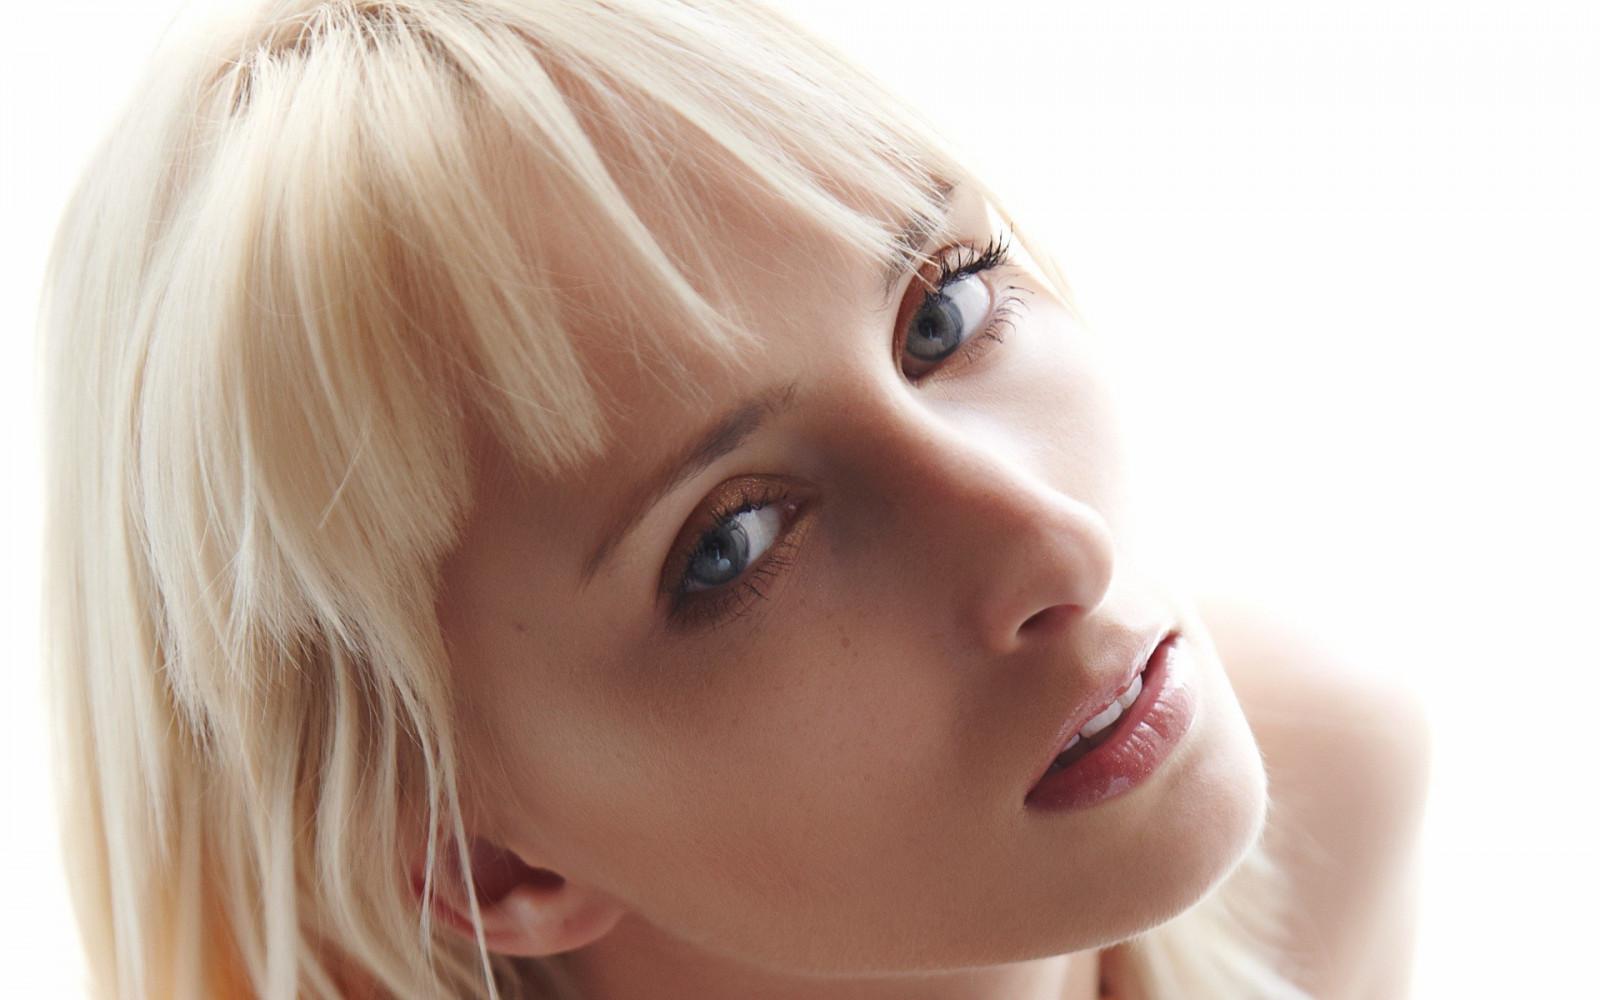 Wallpaper Face Model Blonde Long Hair Blue Eyes: Wallpaper : Face, Women, Model, Long Hair, Blue Eyes